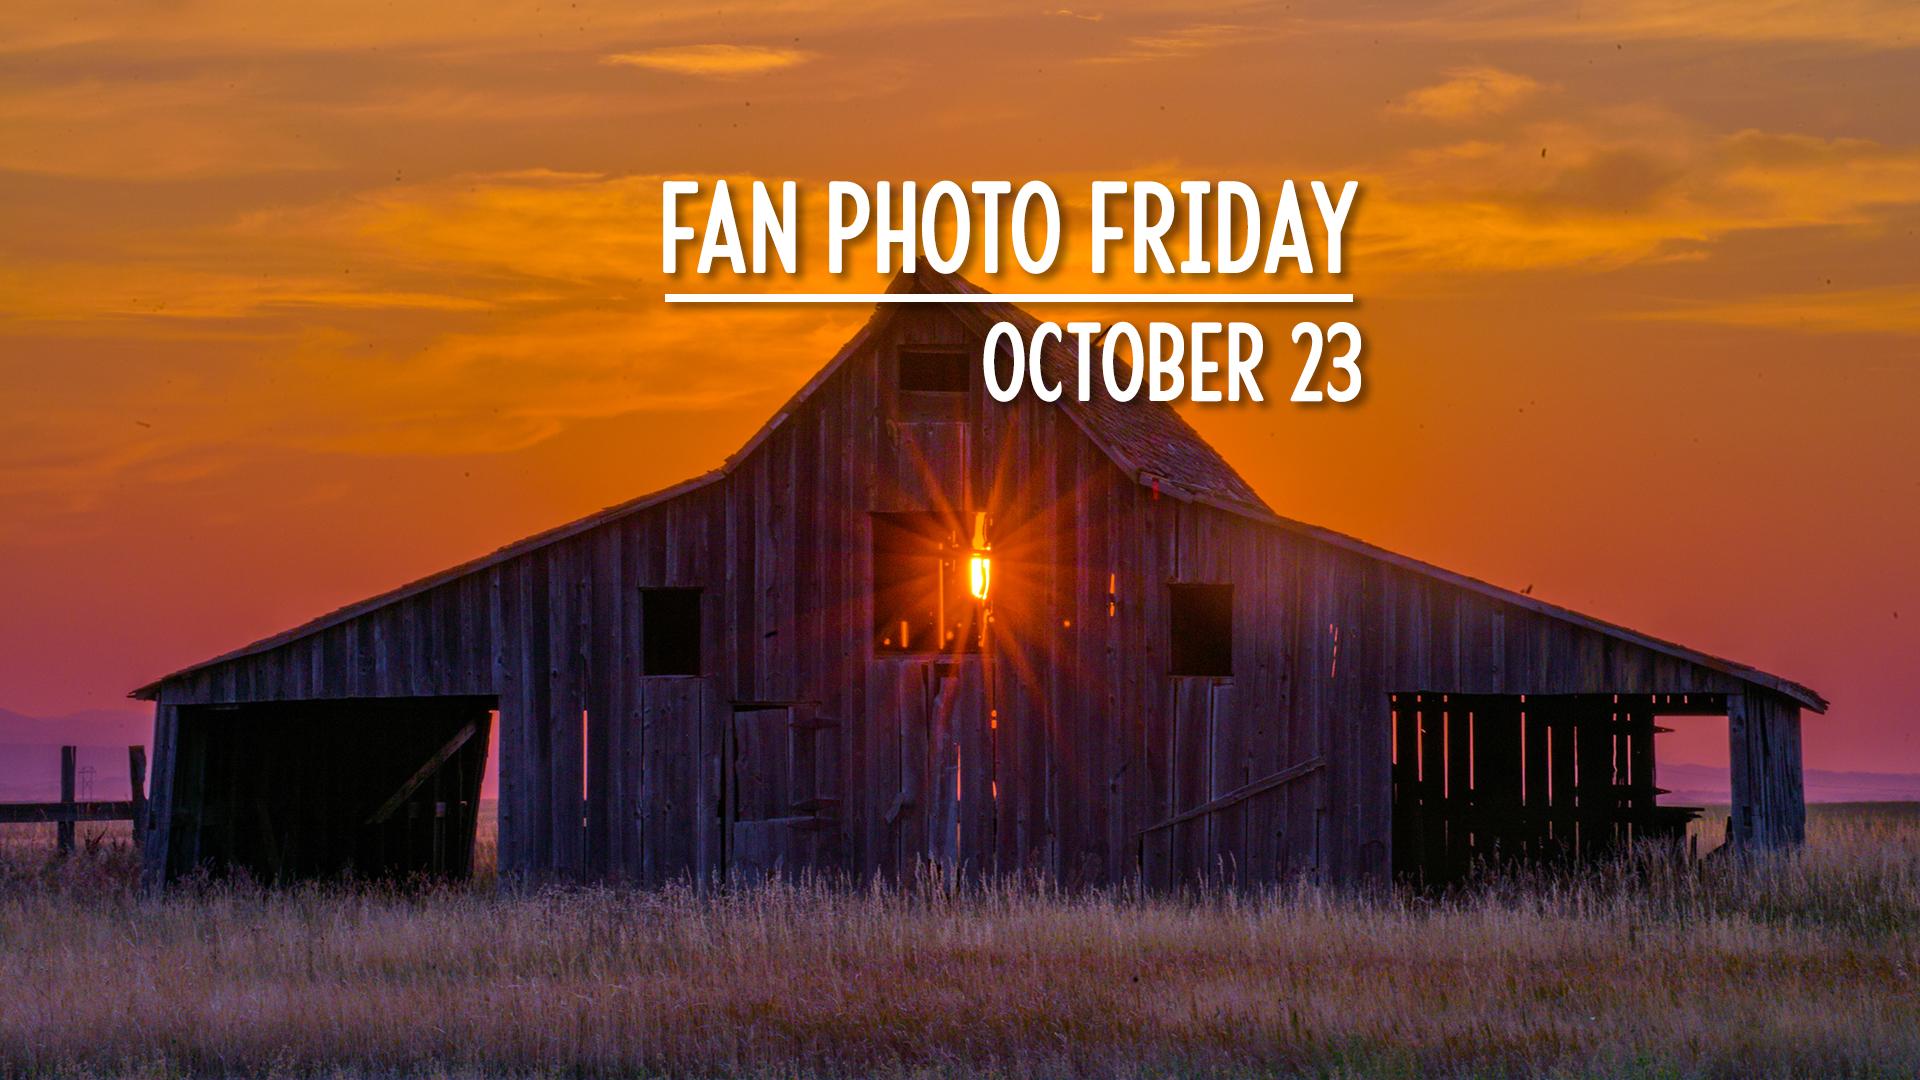 Fan Photo Friday   October 23, 2020